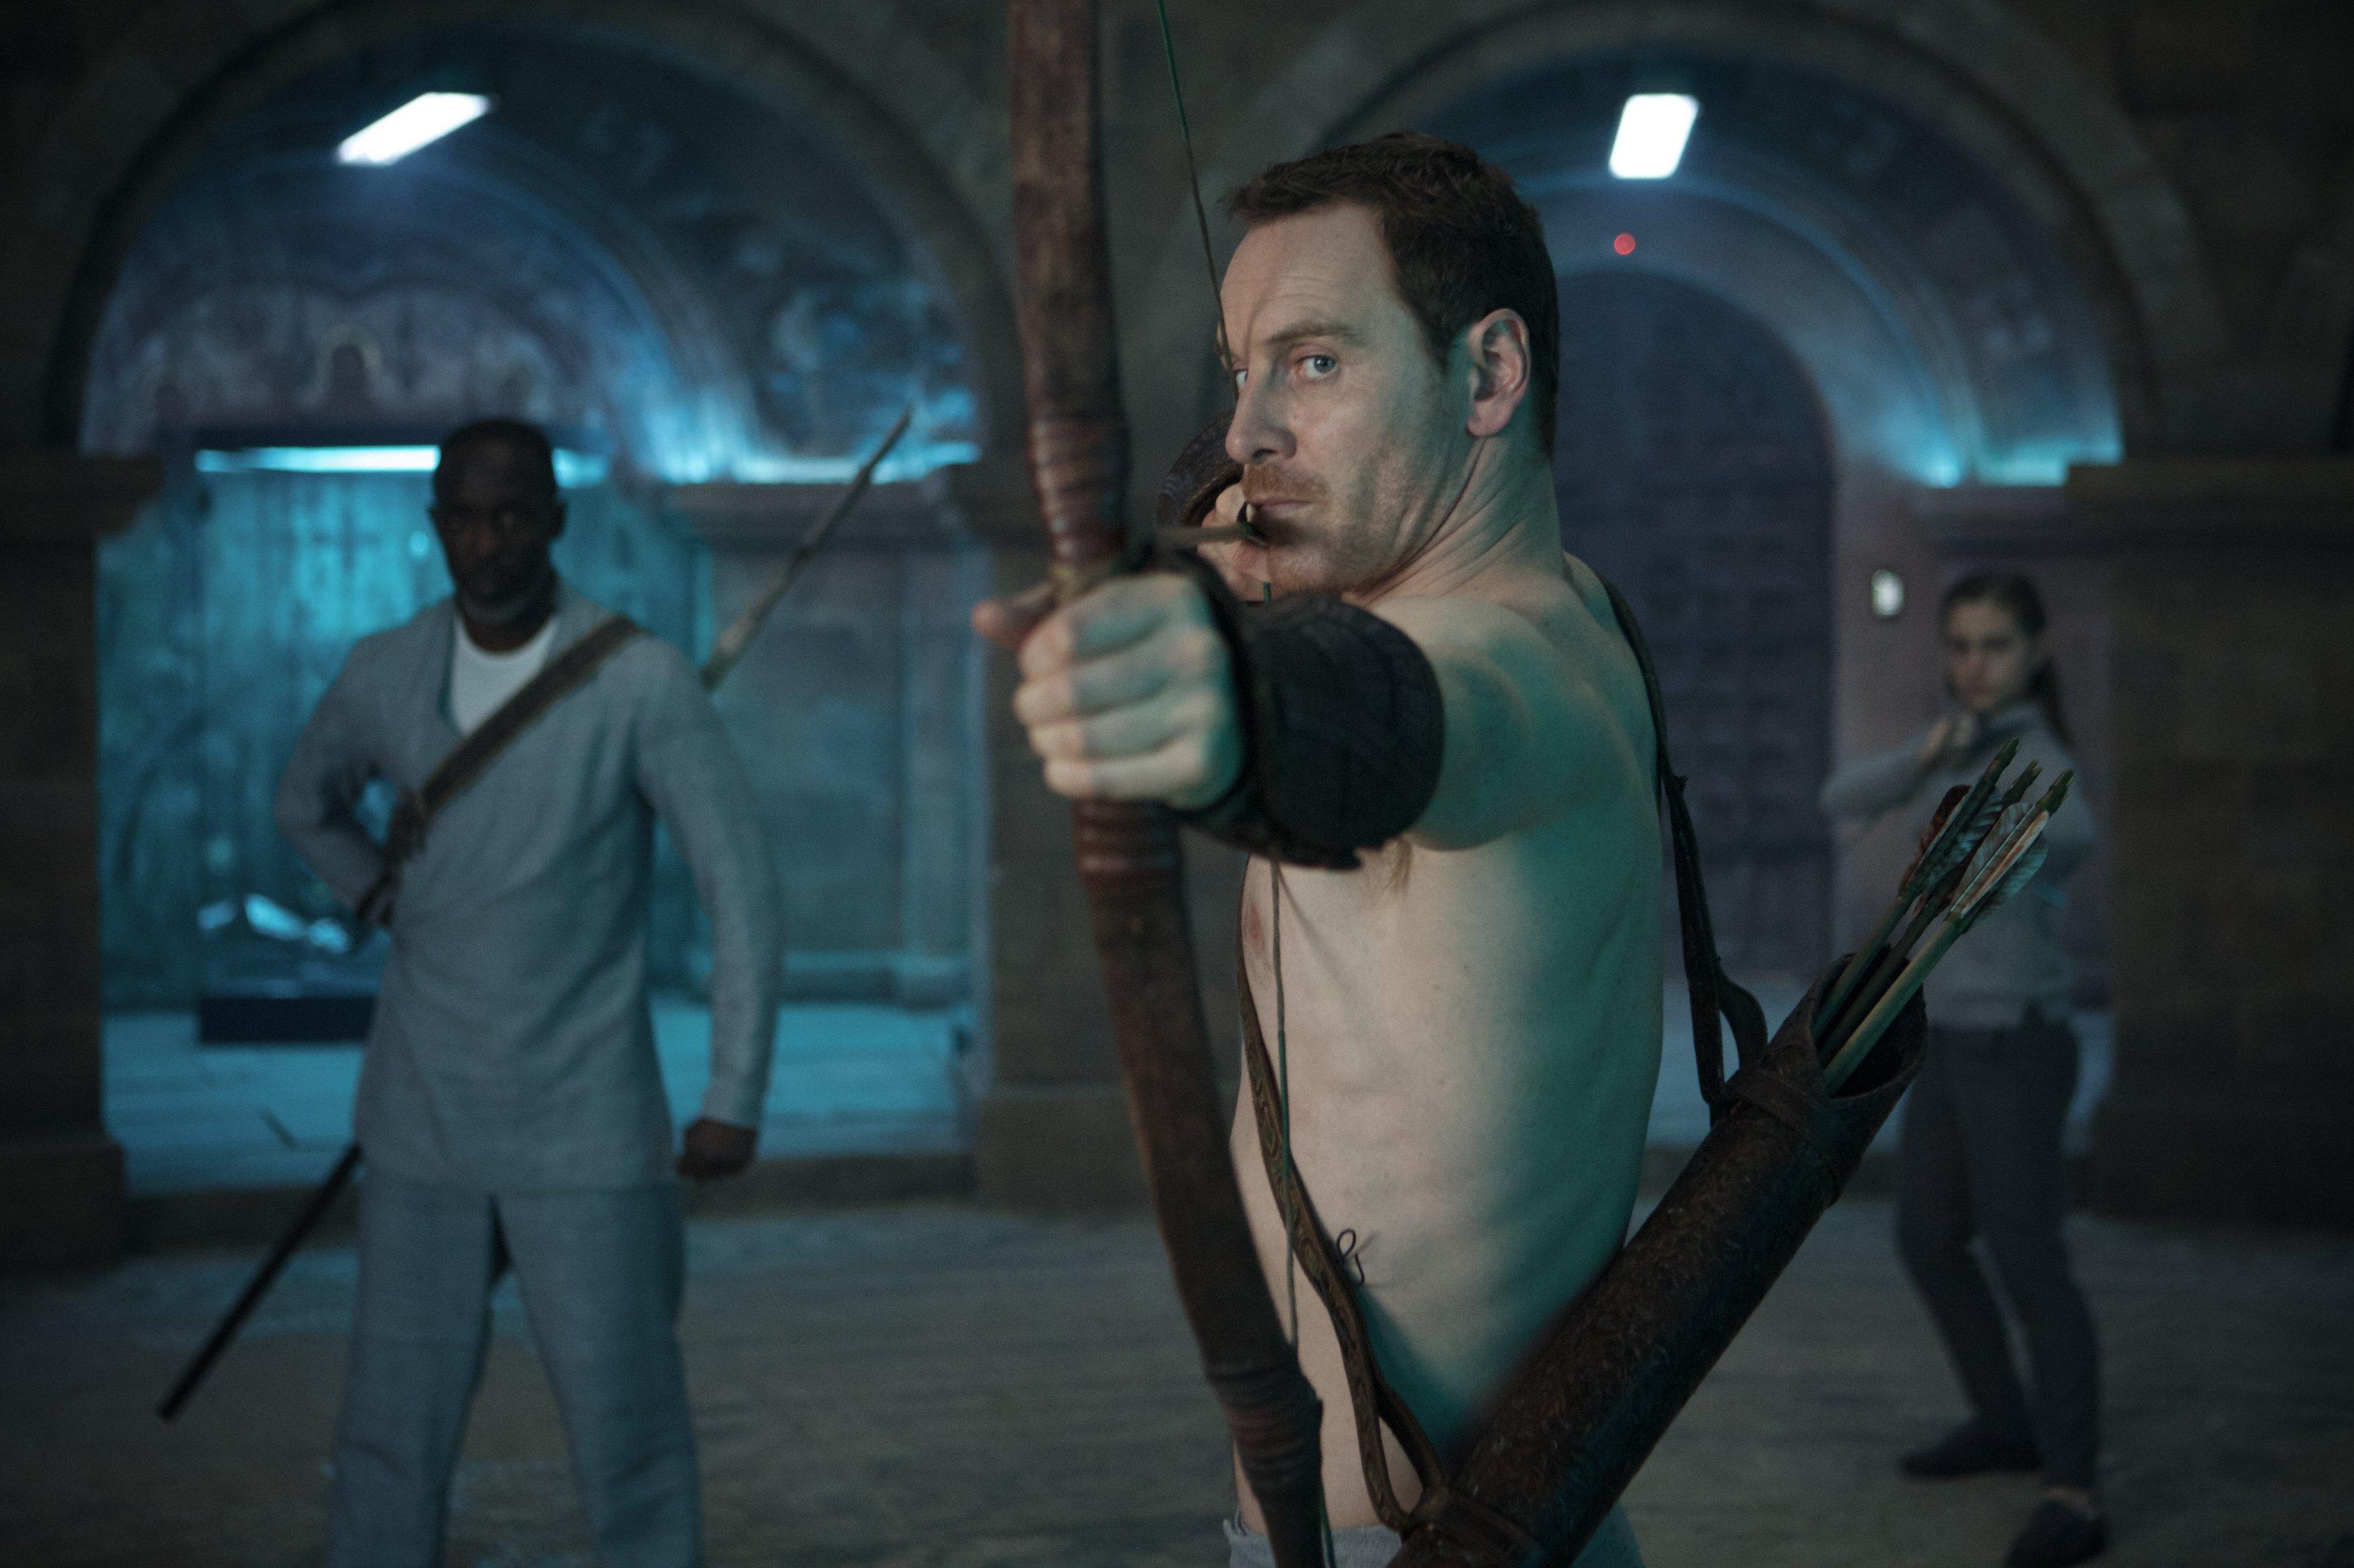 Review - Assassin's Creed - Still 6